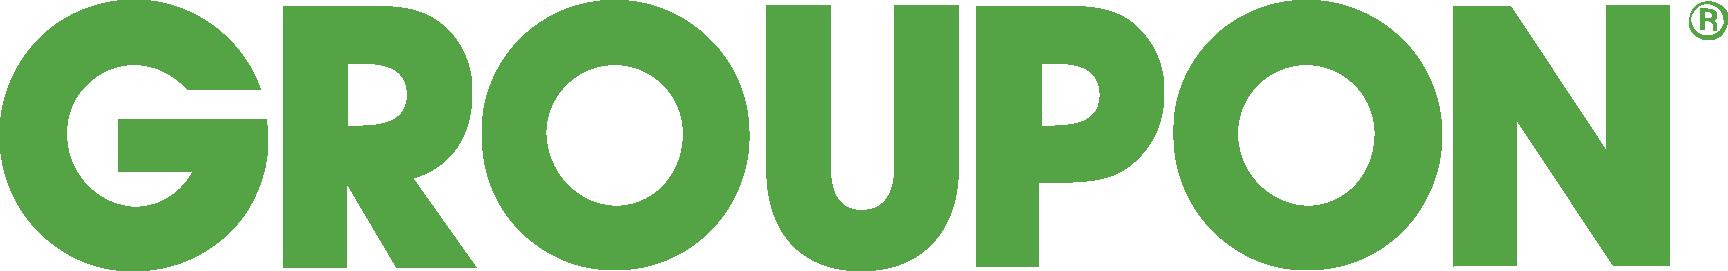 Groupon Logo Download Vector.